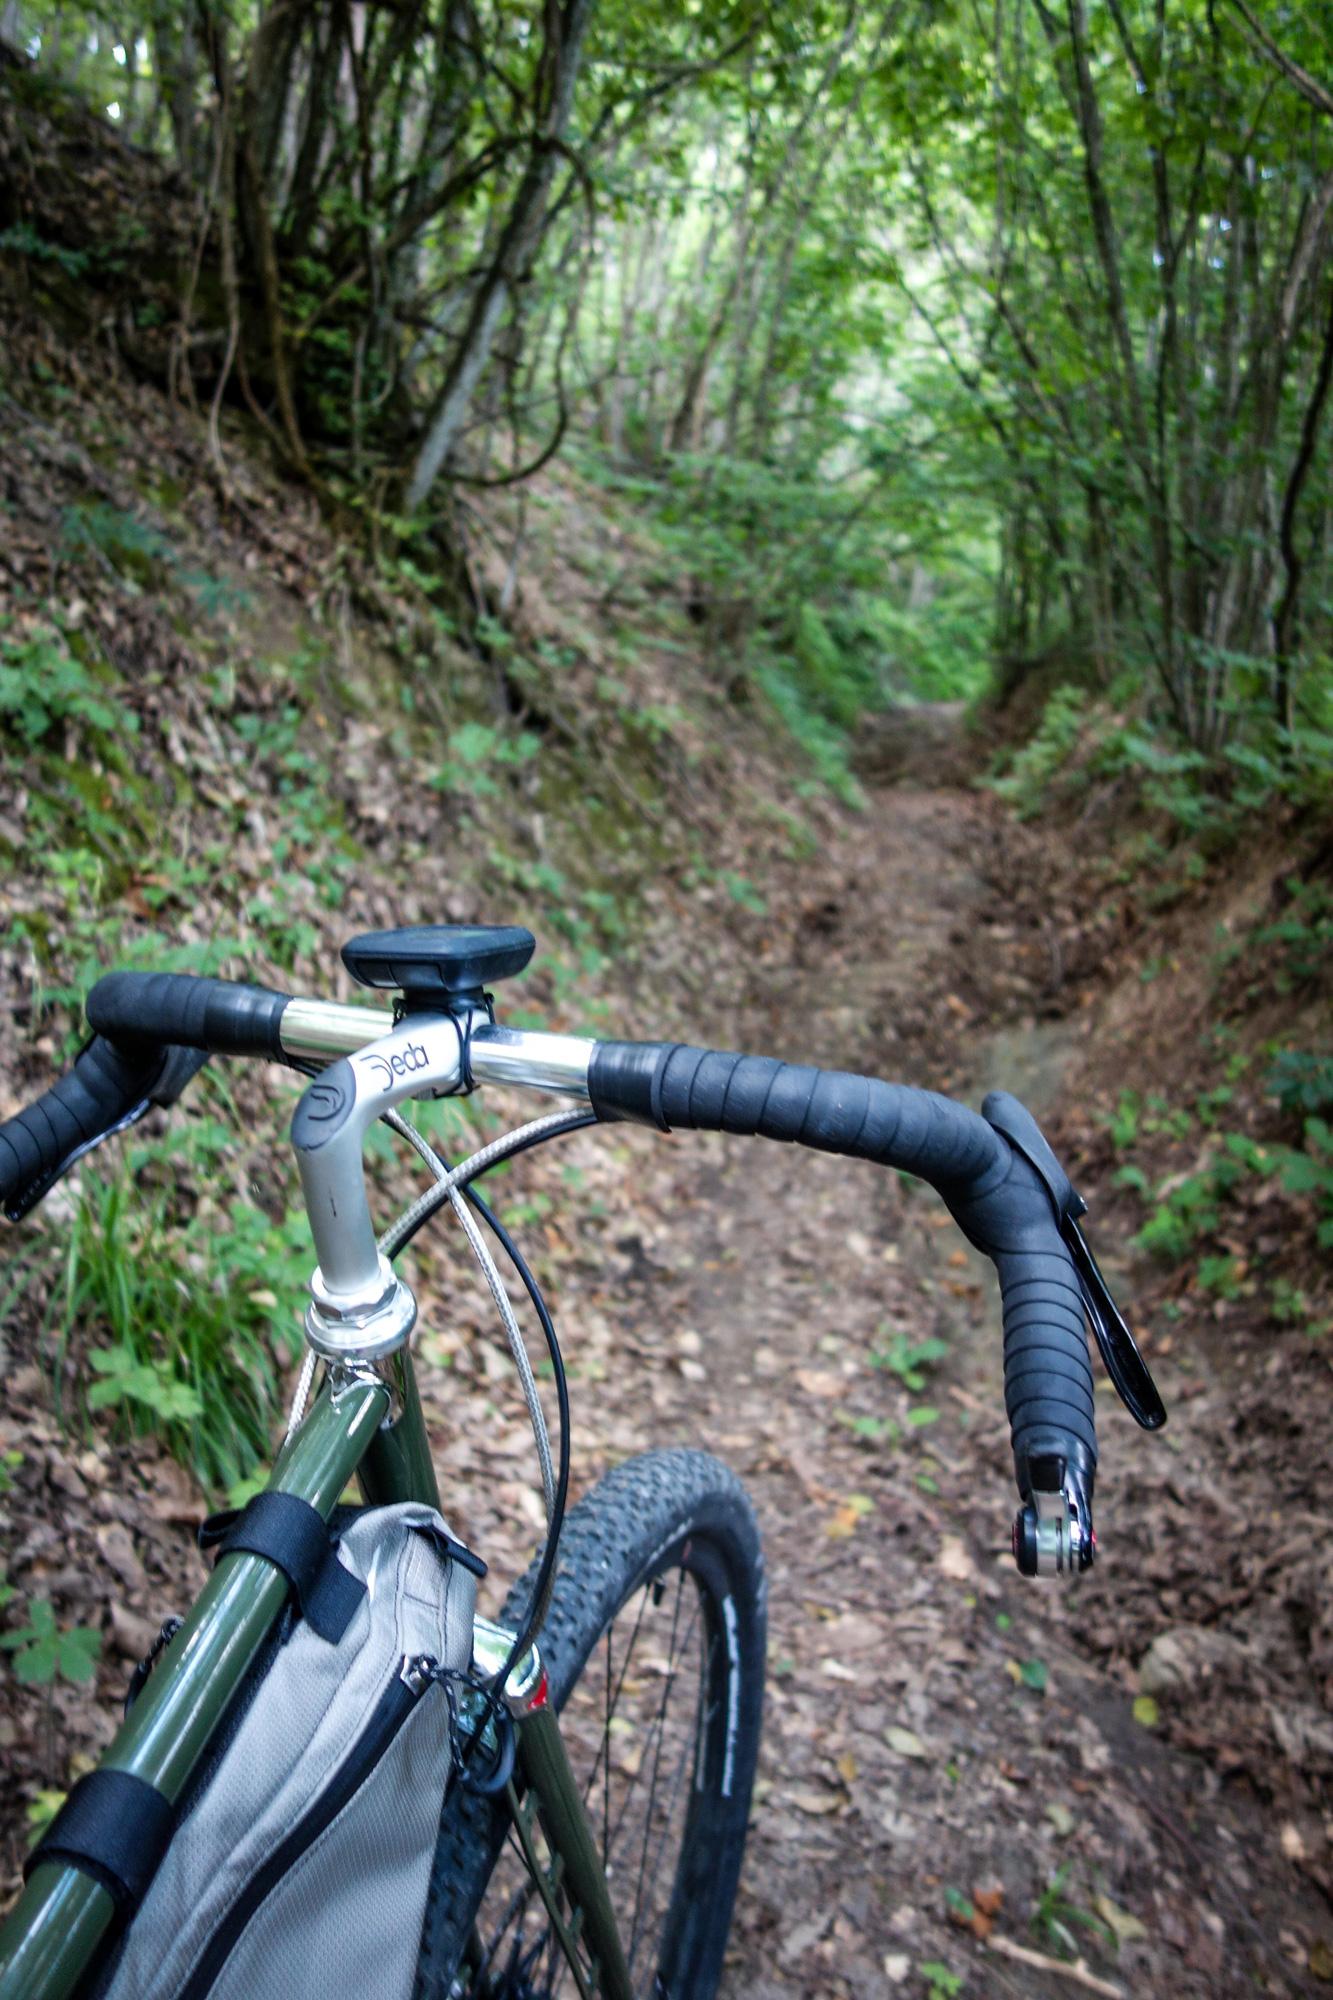 zocca_mtb_ride_appennino_modenese_erman_bike_dimondi-3